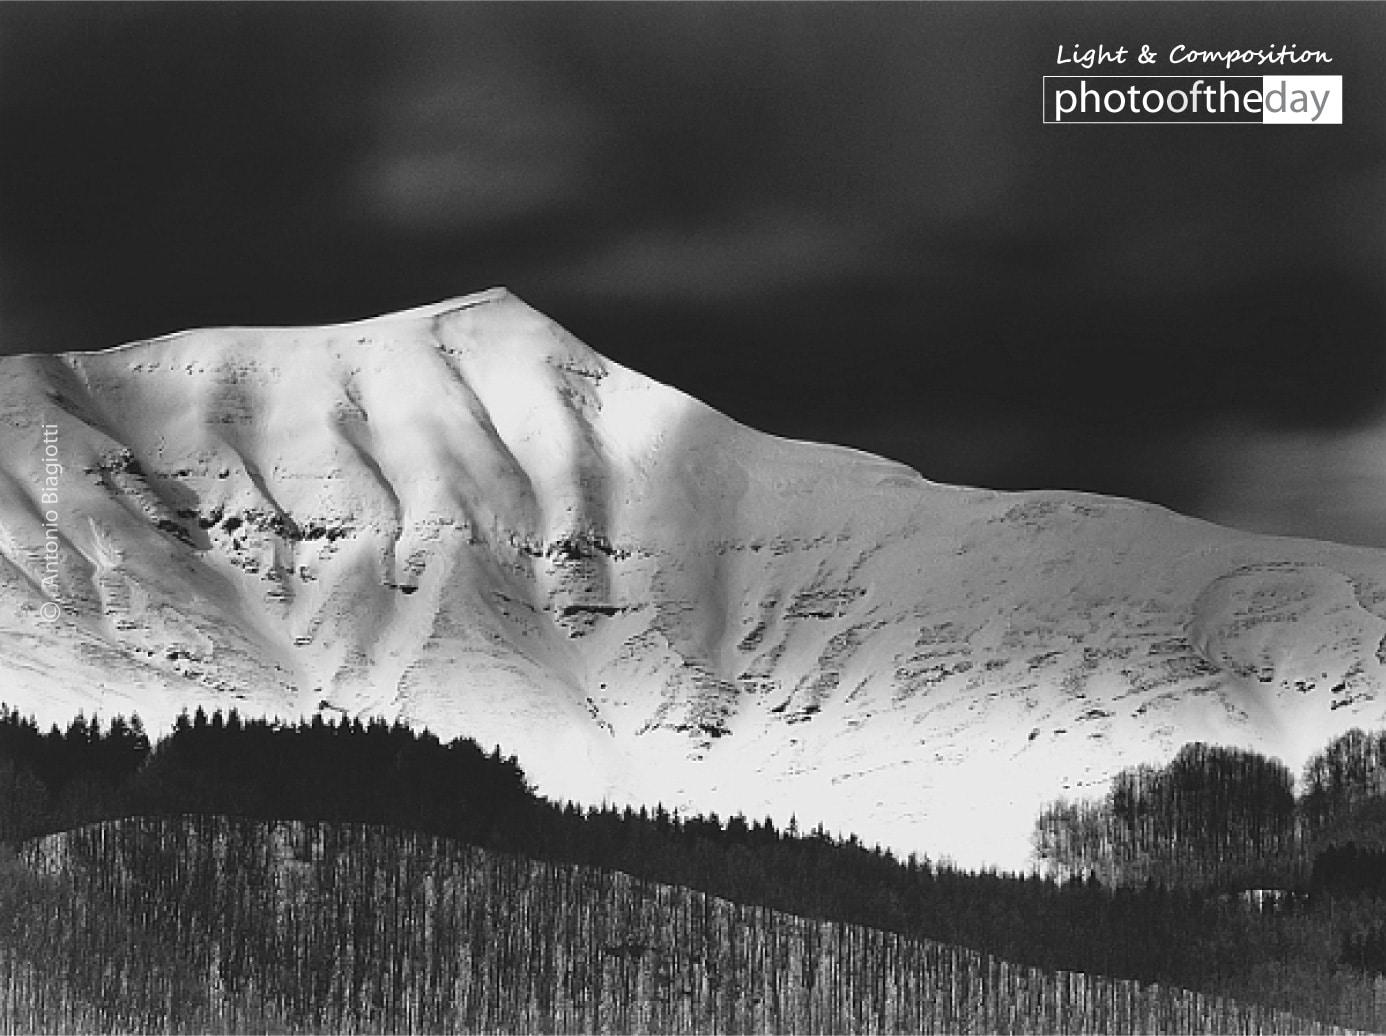 Mountain Spigolino by Antonio Biagiotti